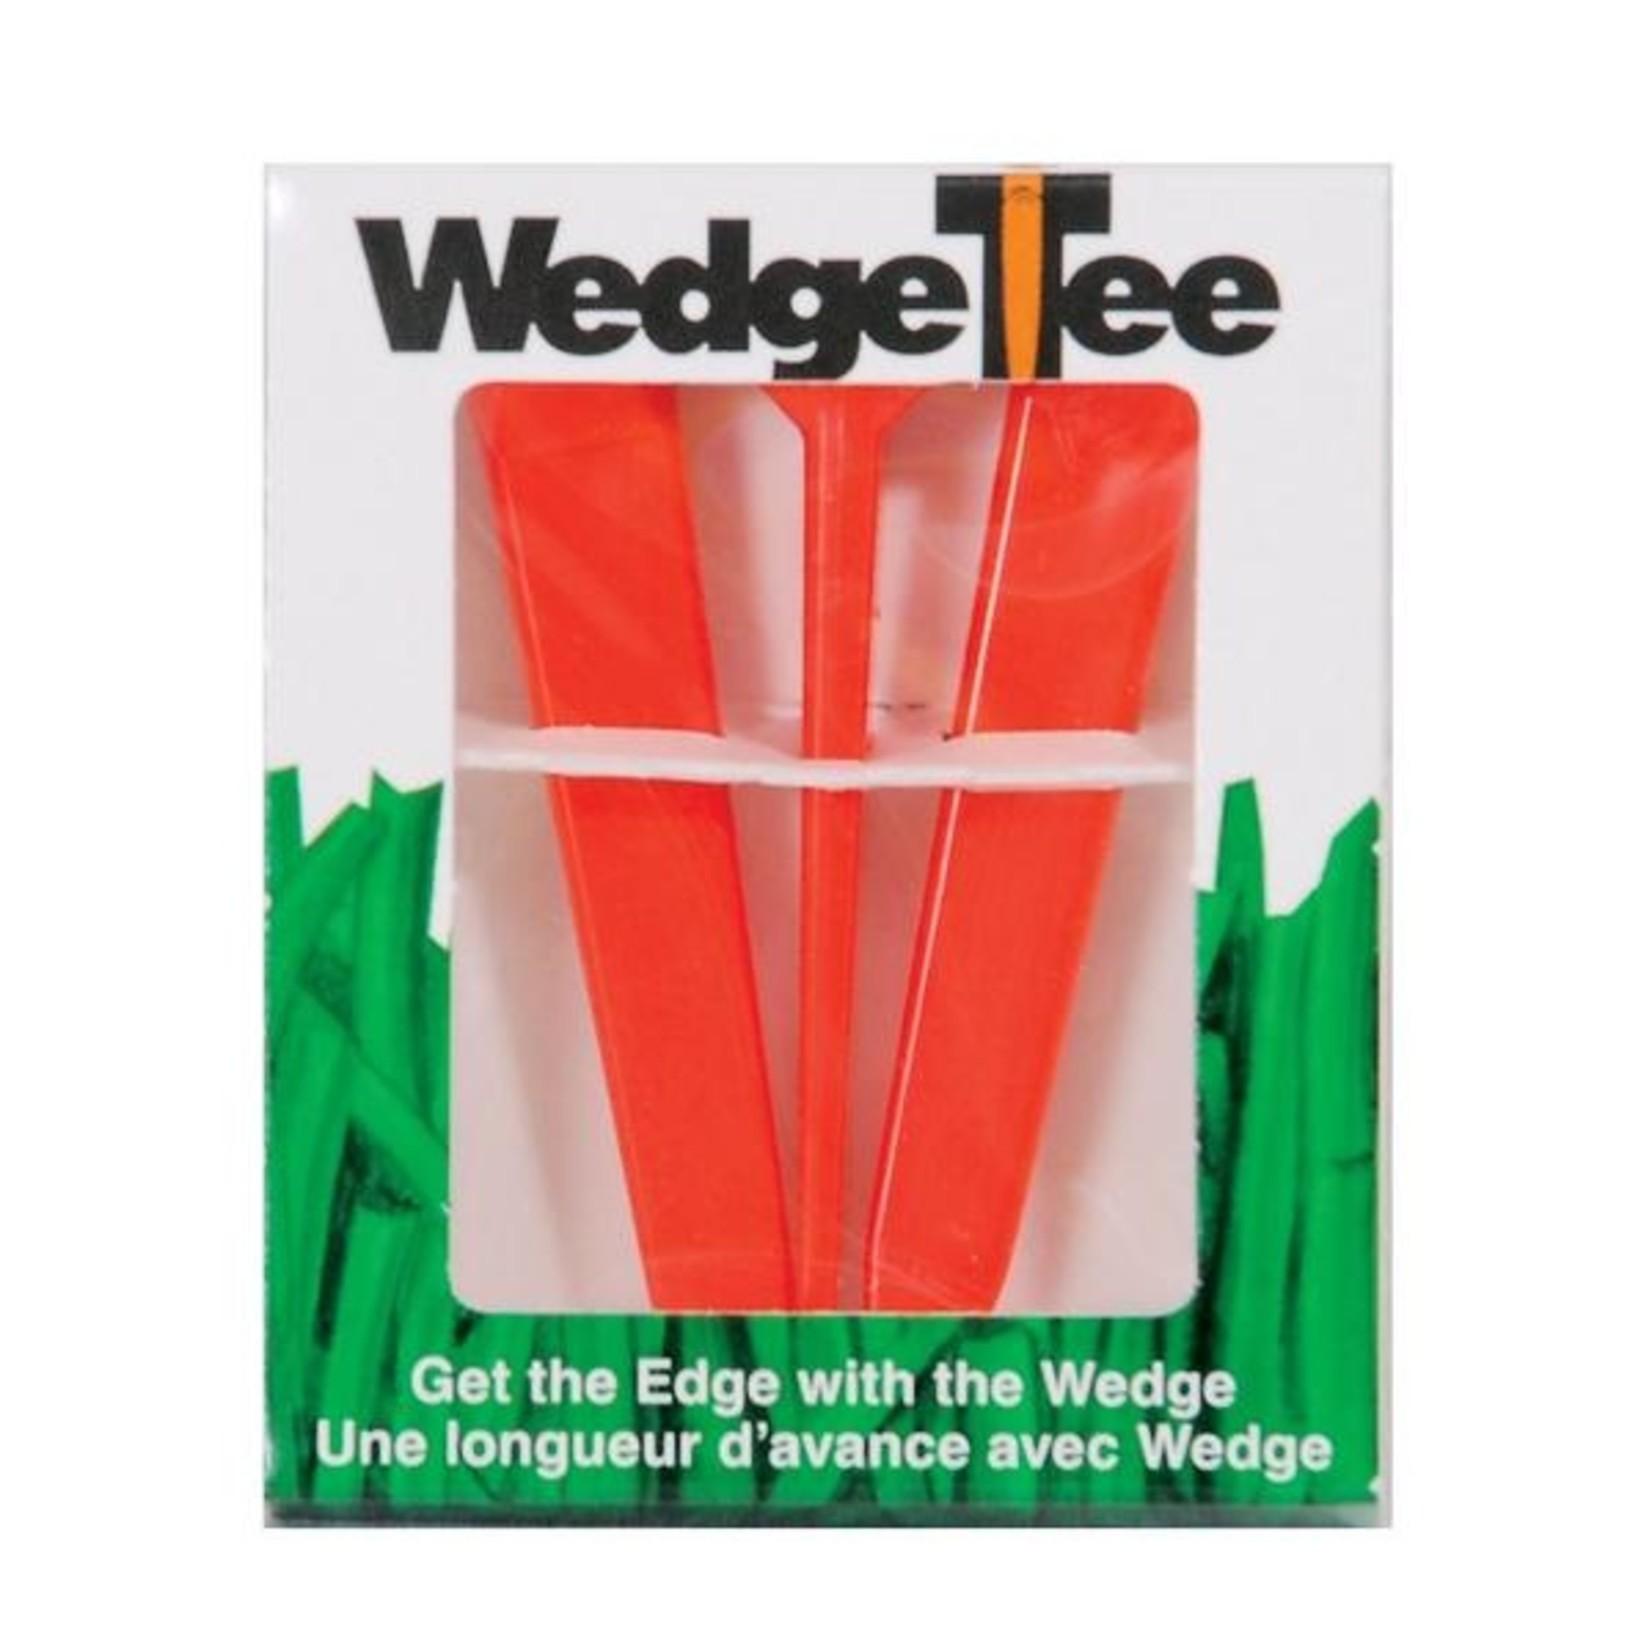 TEE MATE WEDGE TEE 3 PACK